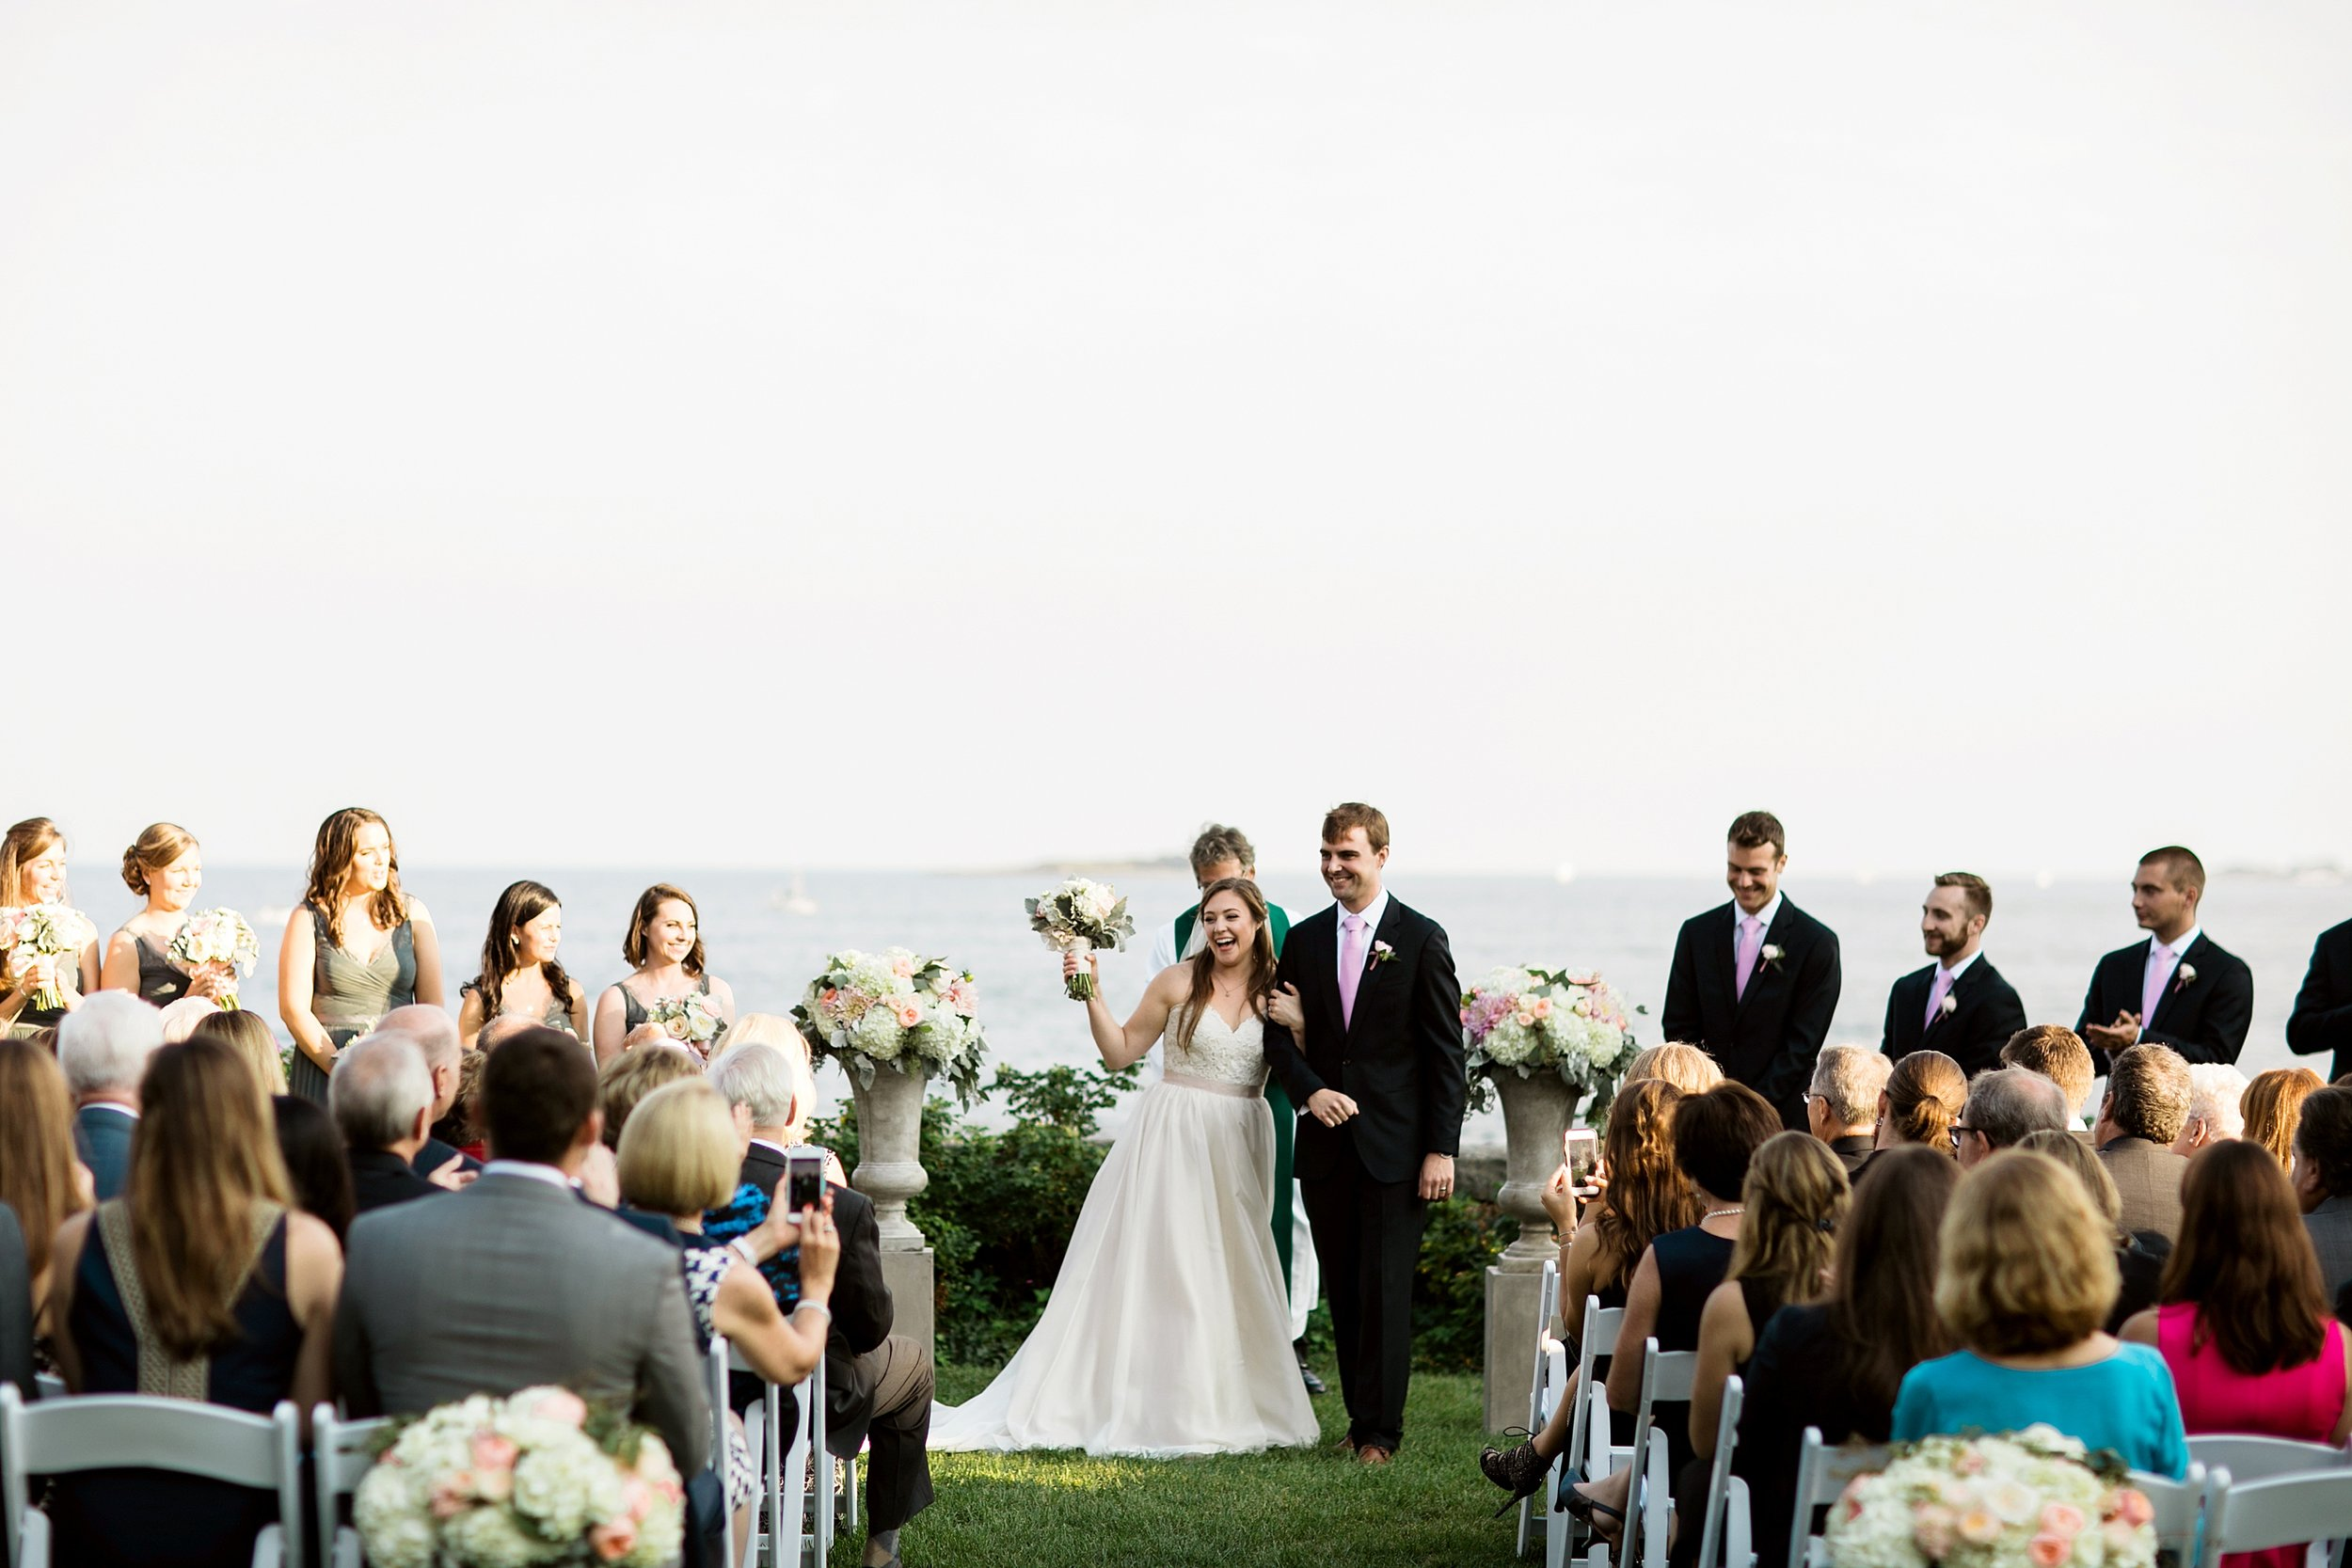 035 los angeles wedding photographer todd danforth photography boston.jpg